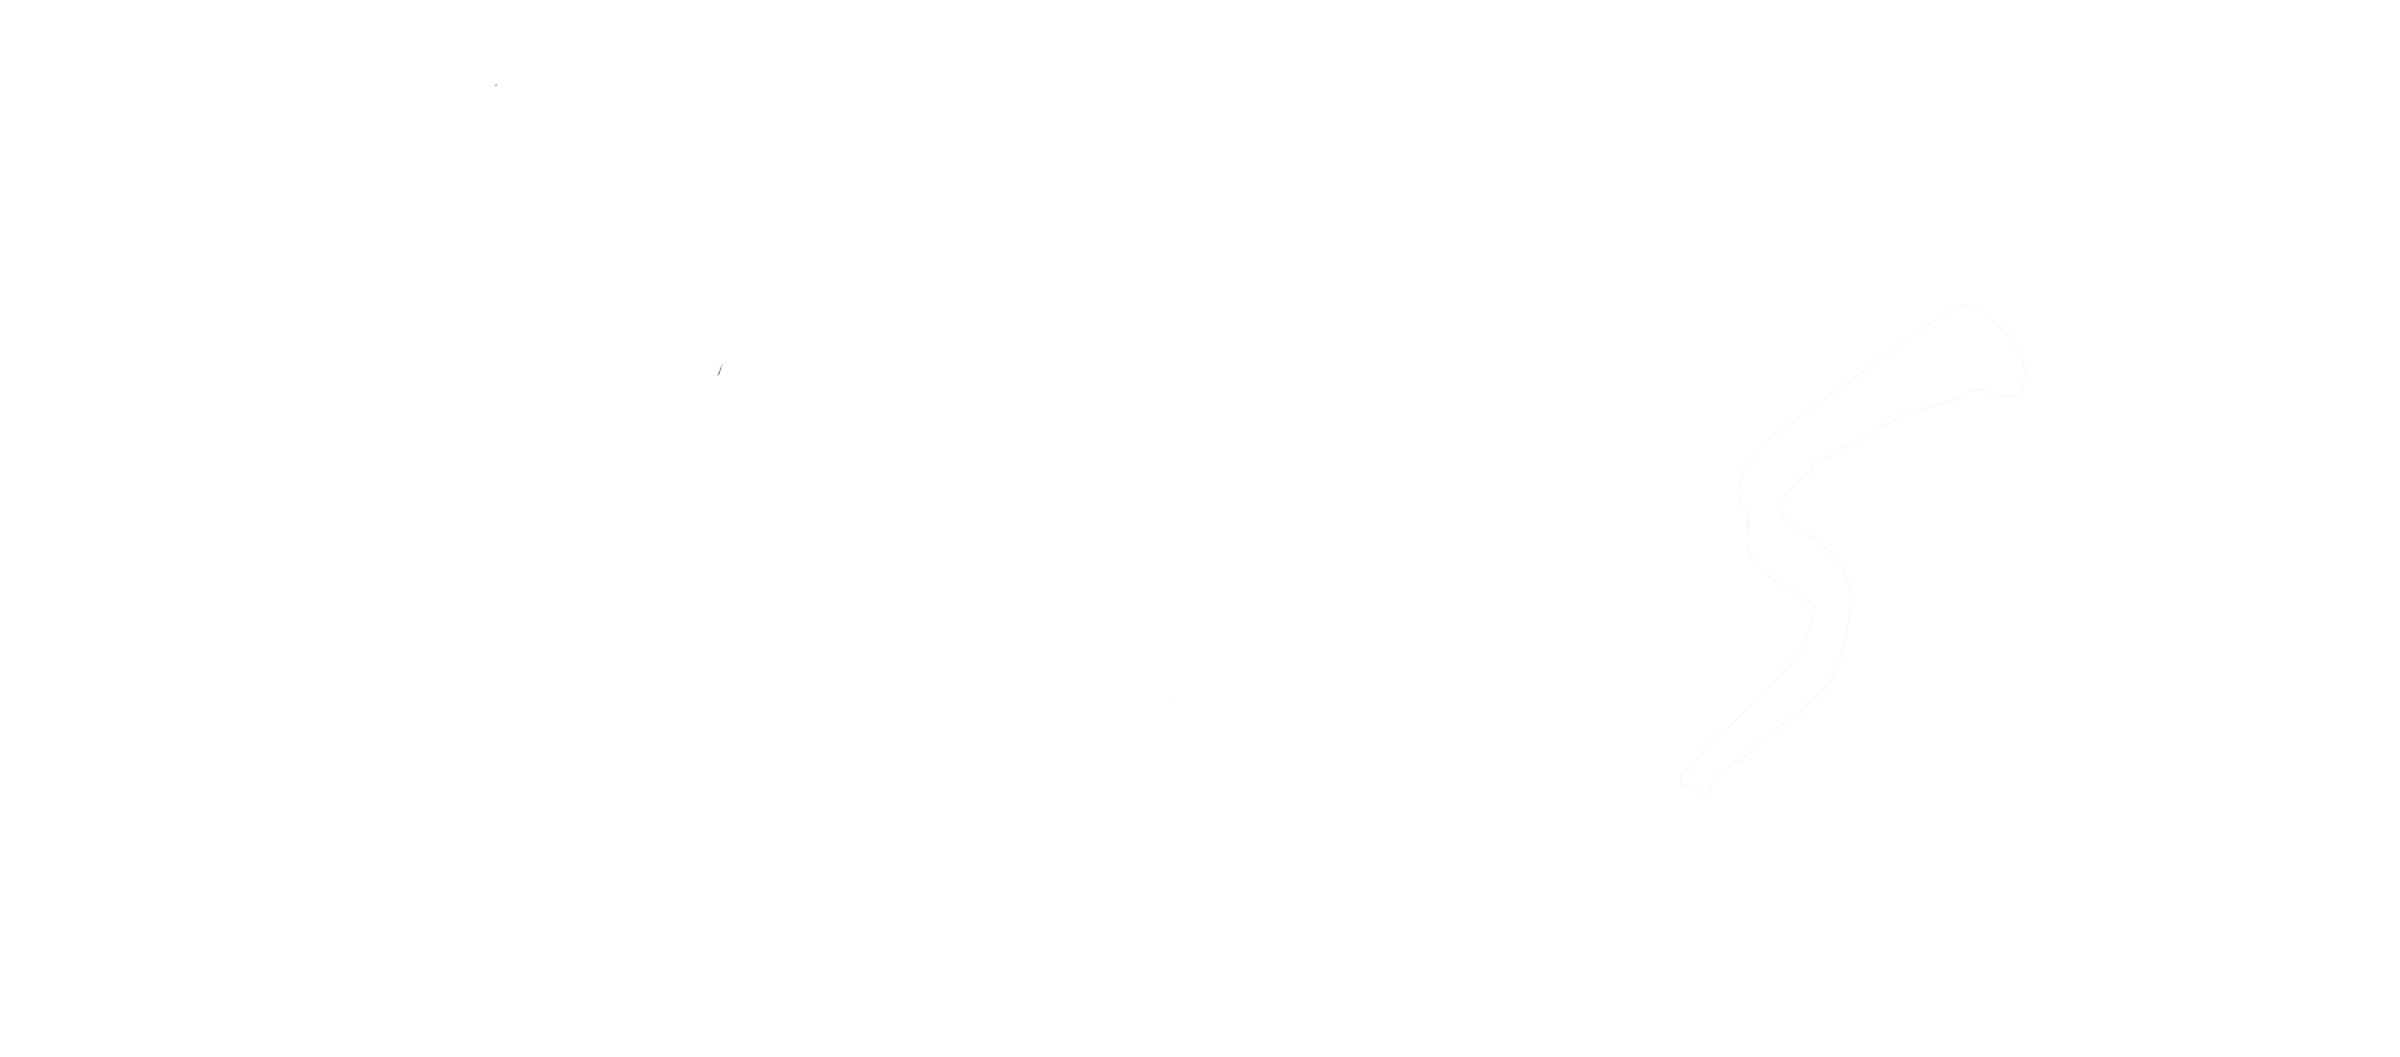 Blowfish Malibu Logo